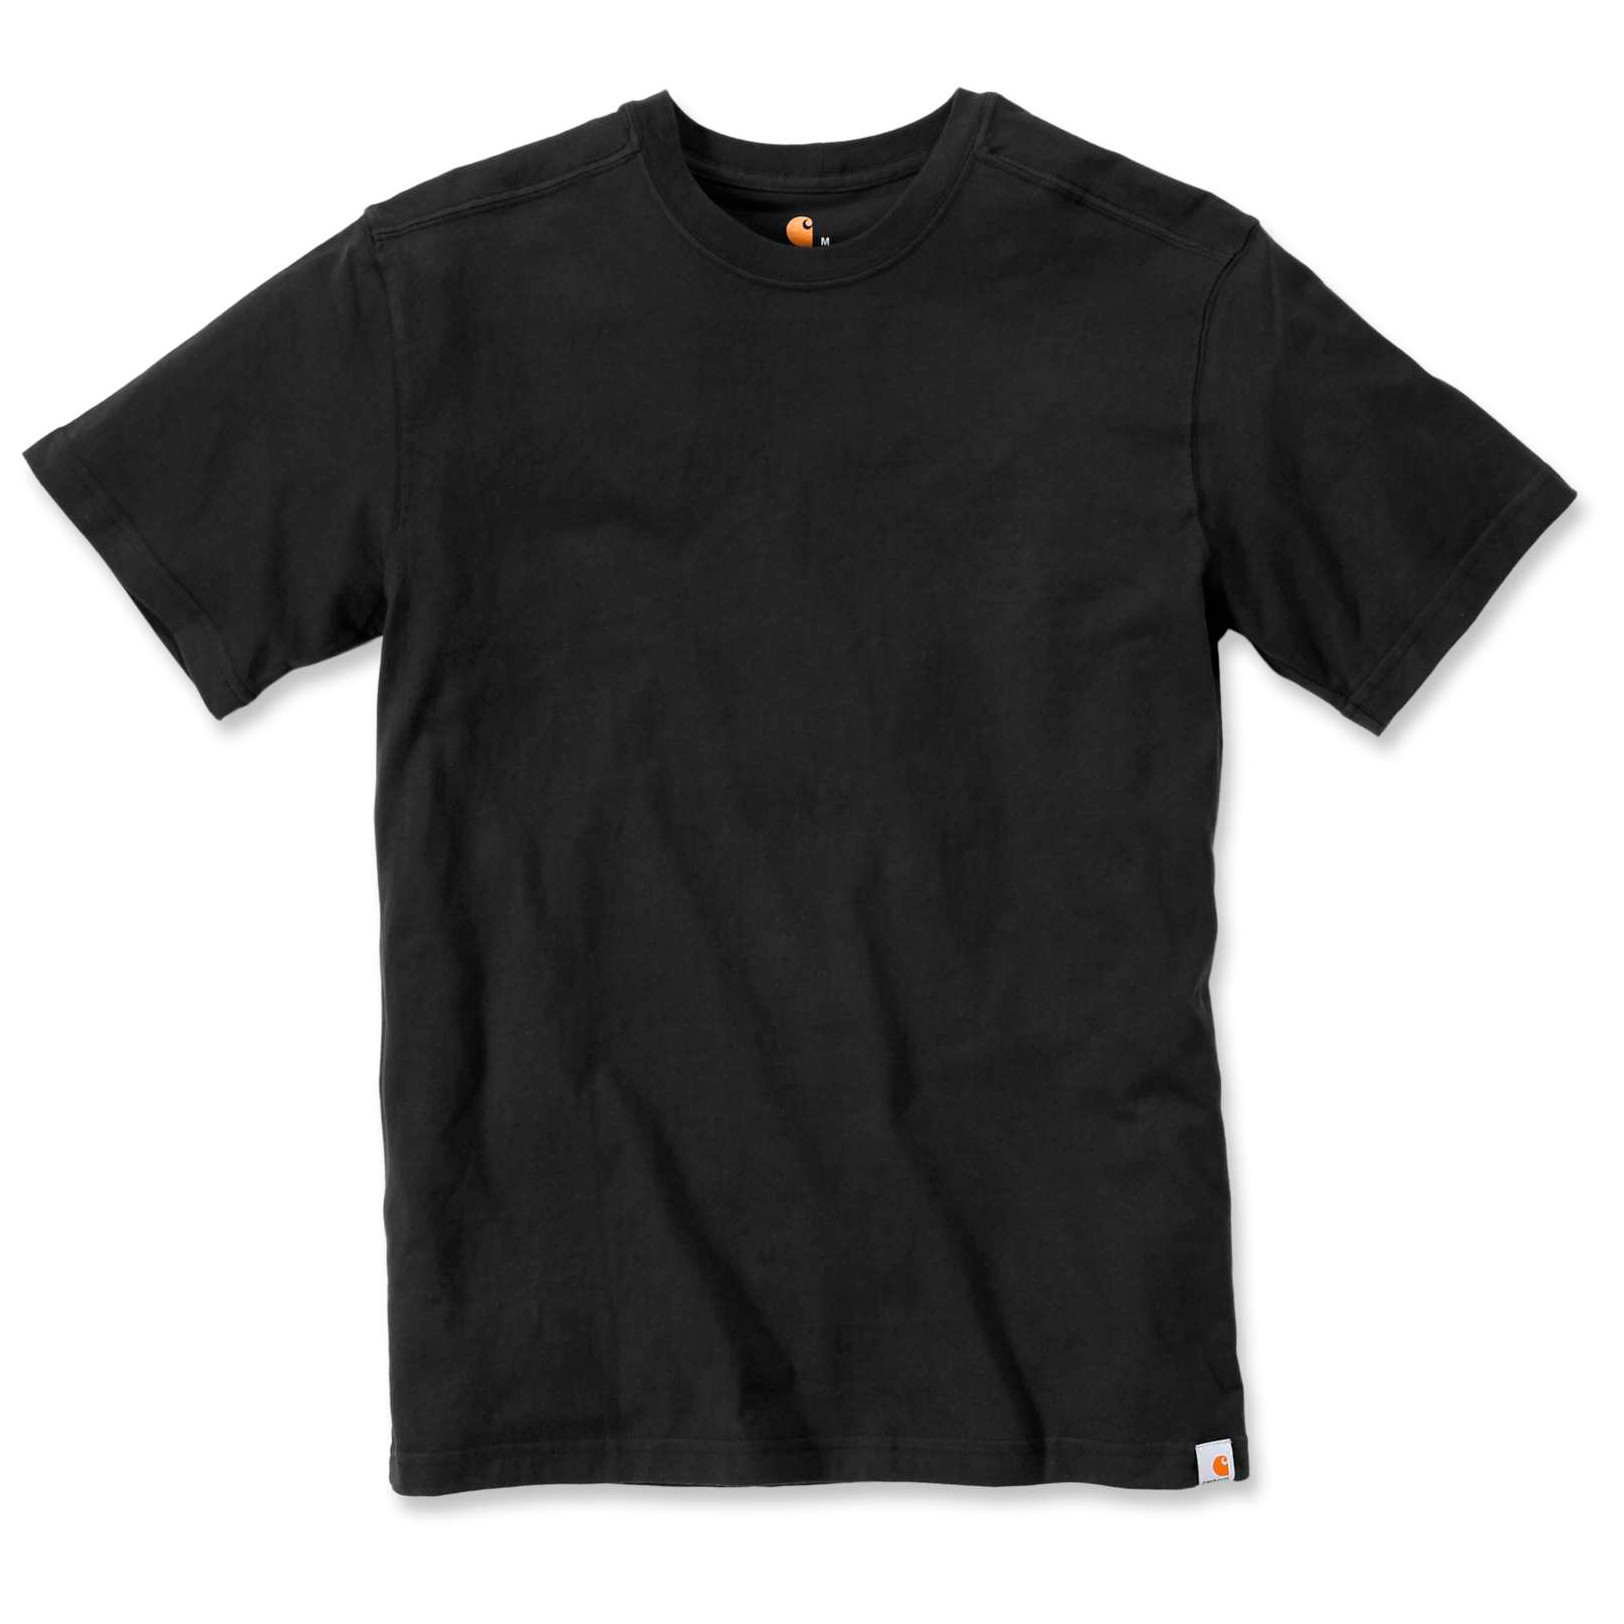 Футболка Carhartt Maddock T-Shirt S/S - 101124 (Black, L)